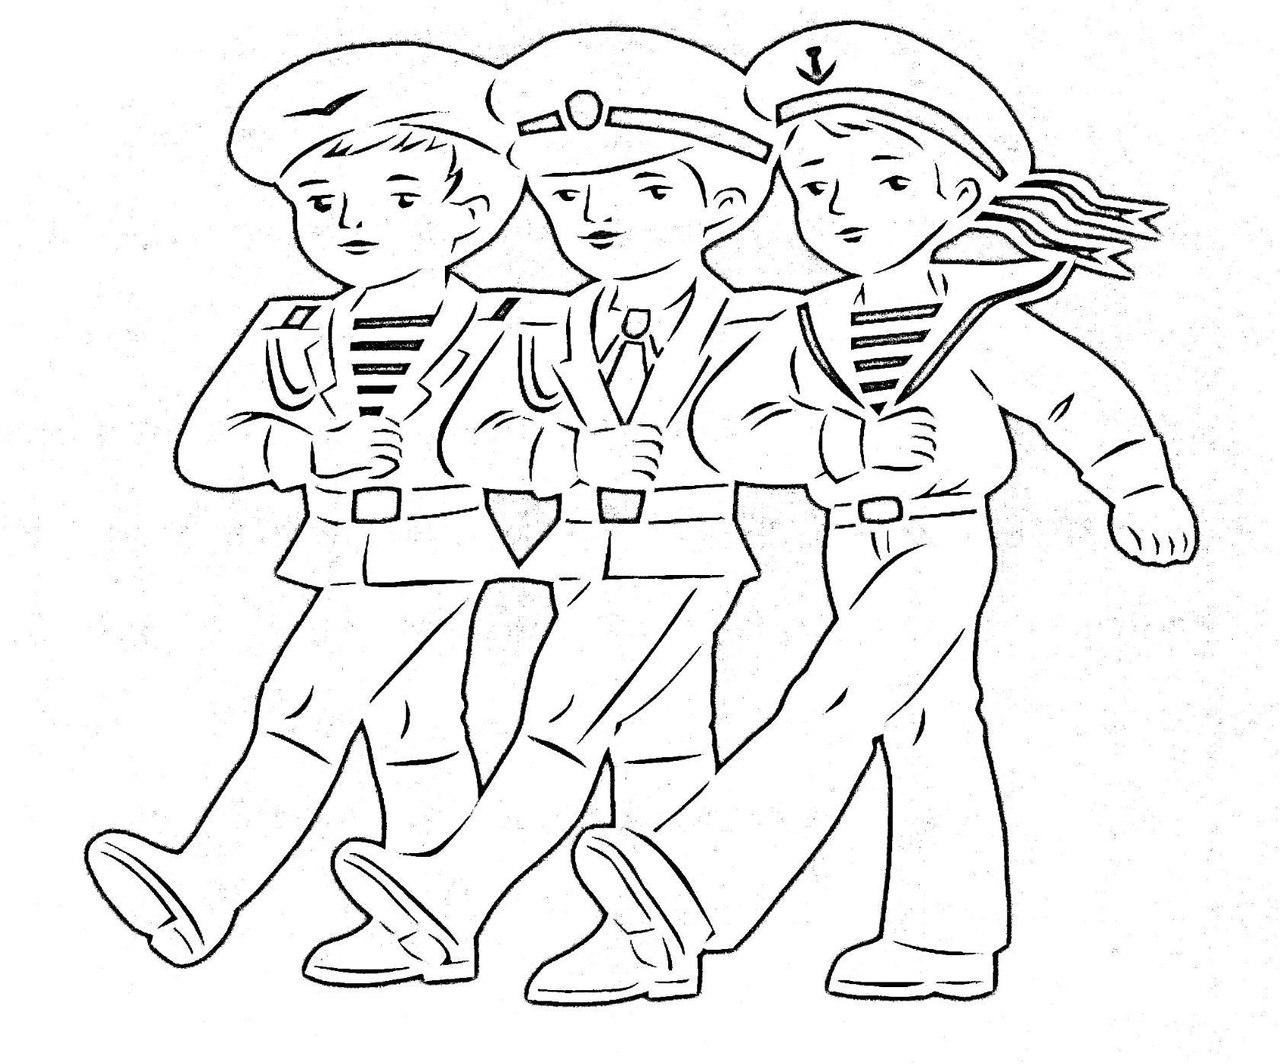 Солдат шаблоны 23 февраля